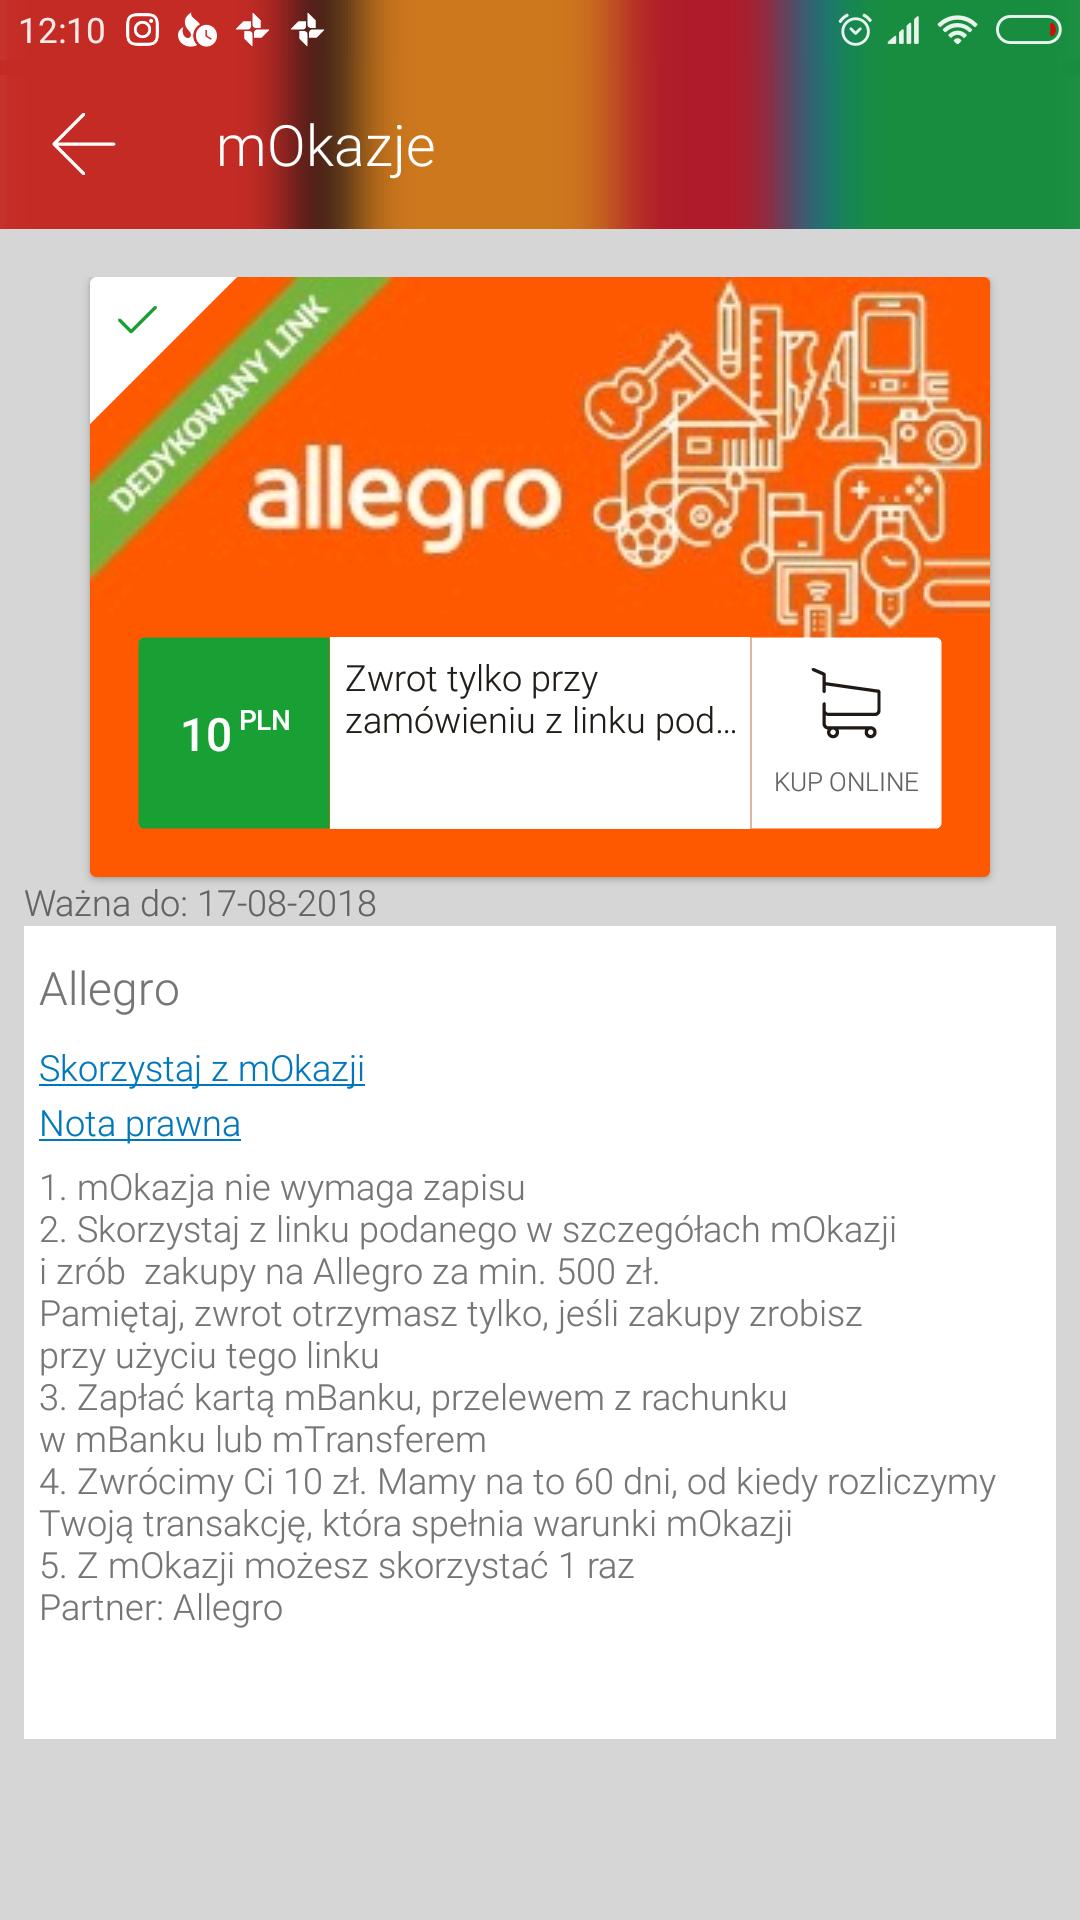 mBank - zwrot 10zł za zakupy na Allegro za minimum 500zł